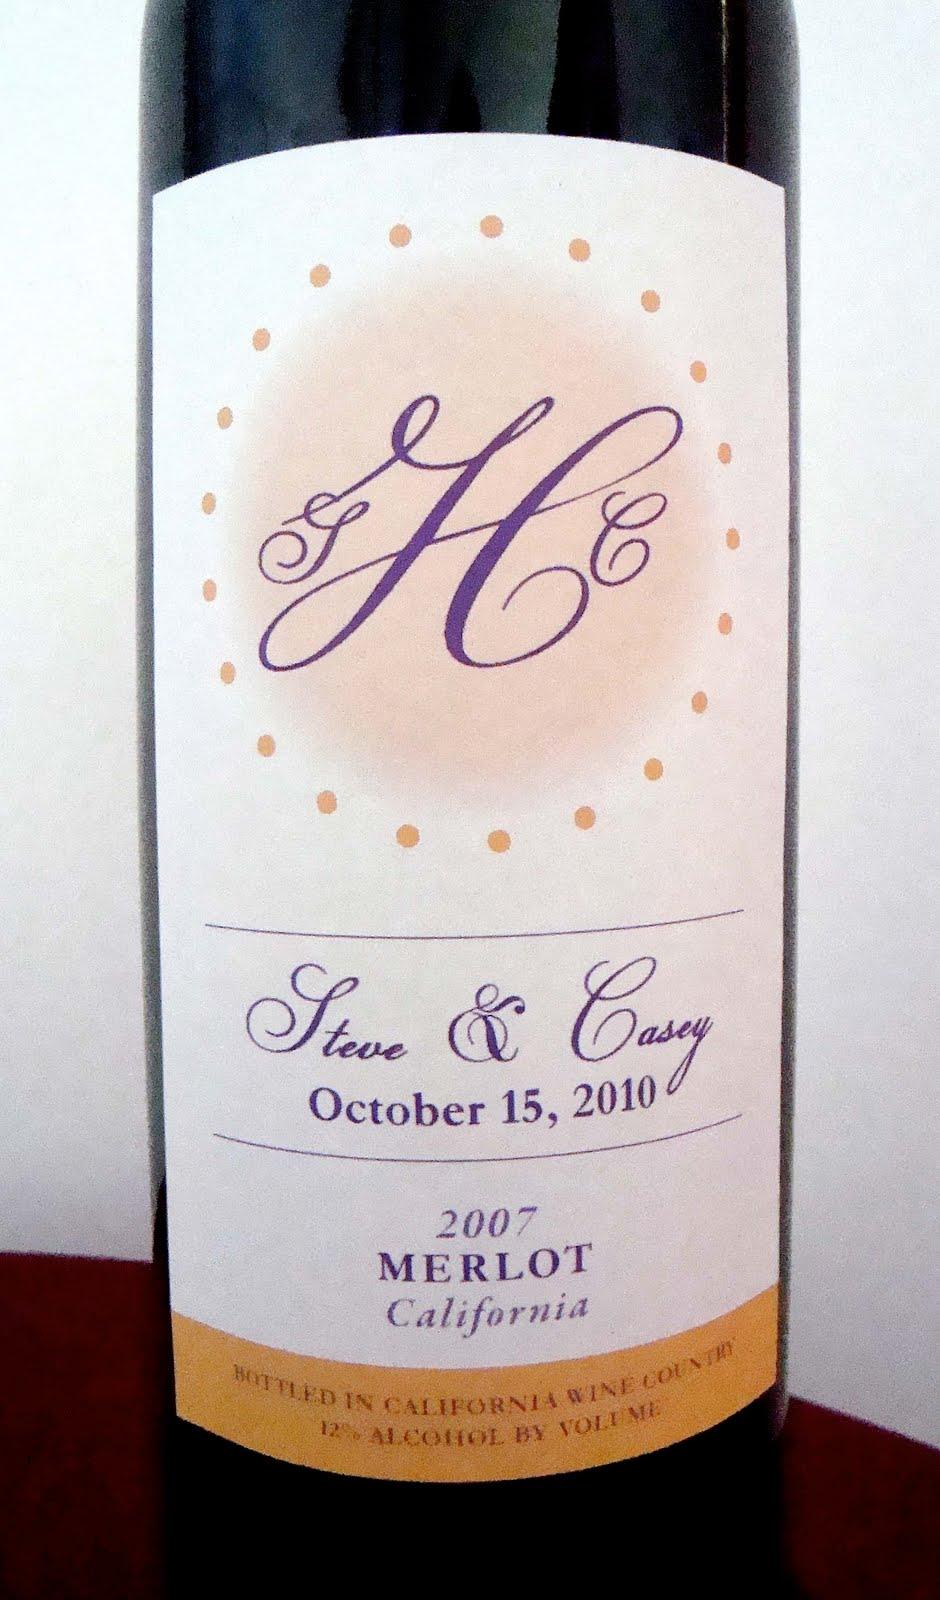 Wedding Wine Bottle Label Template Labels: packaging, wedding